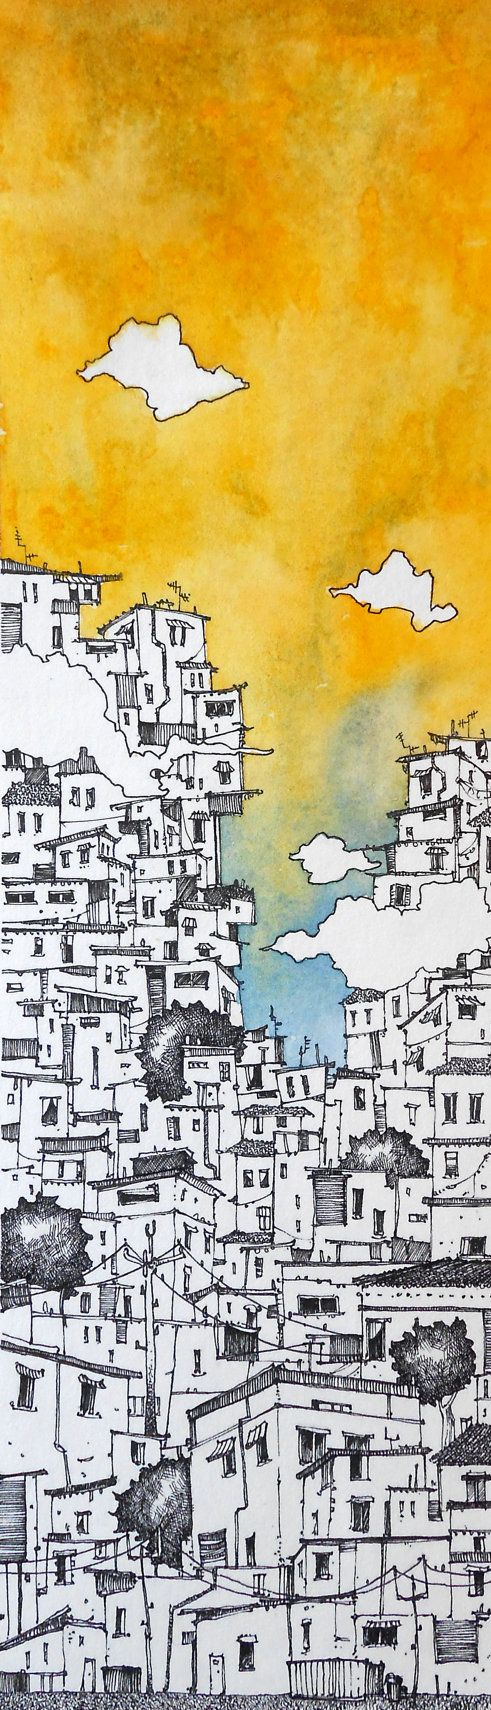 Sunny Favelas, Original Pen and Ink Watercolor Illustration by Duncan Halleck 37cm x 13.5cm - duncanhalleck.com